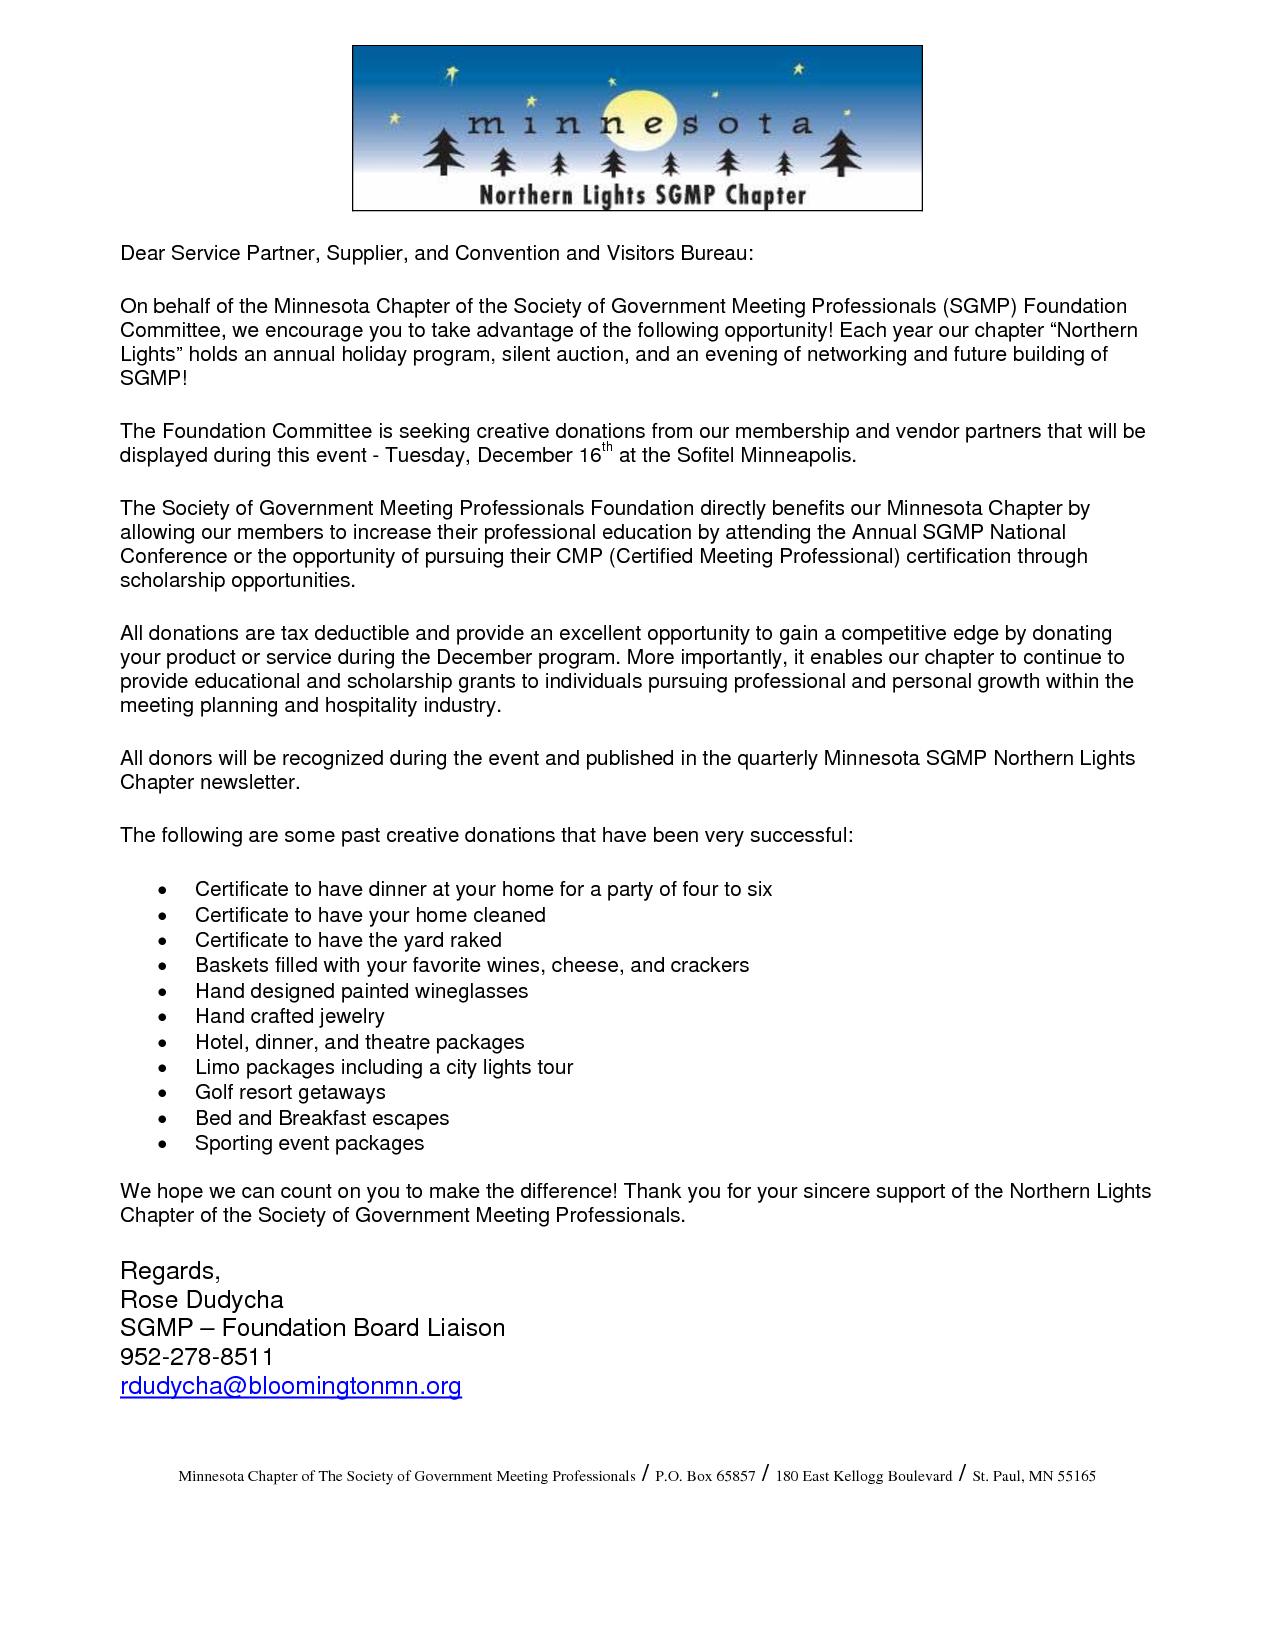 Silent Auction Donation Request Letter Template - Letter Intent to Give Donation Silent Auction Cover Latter Sample